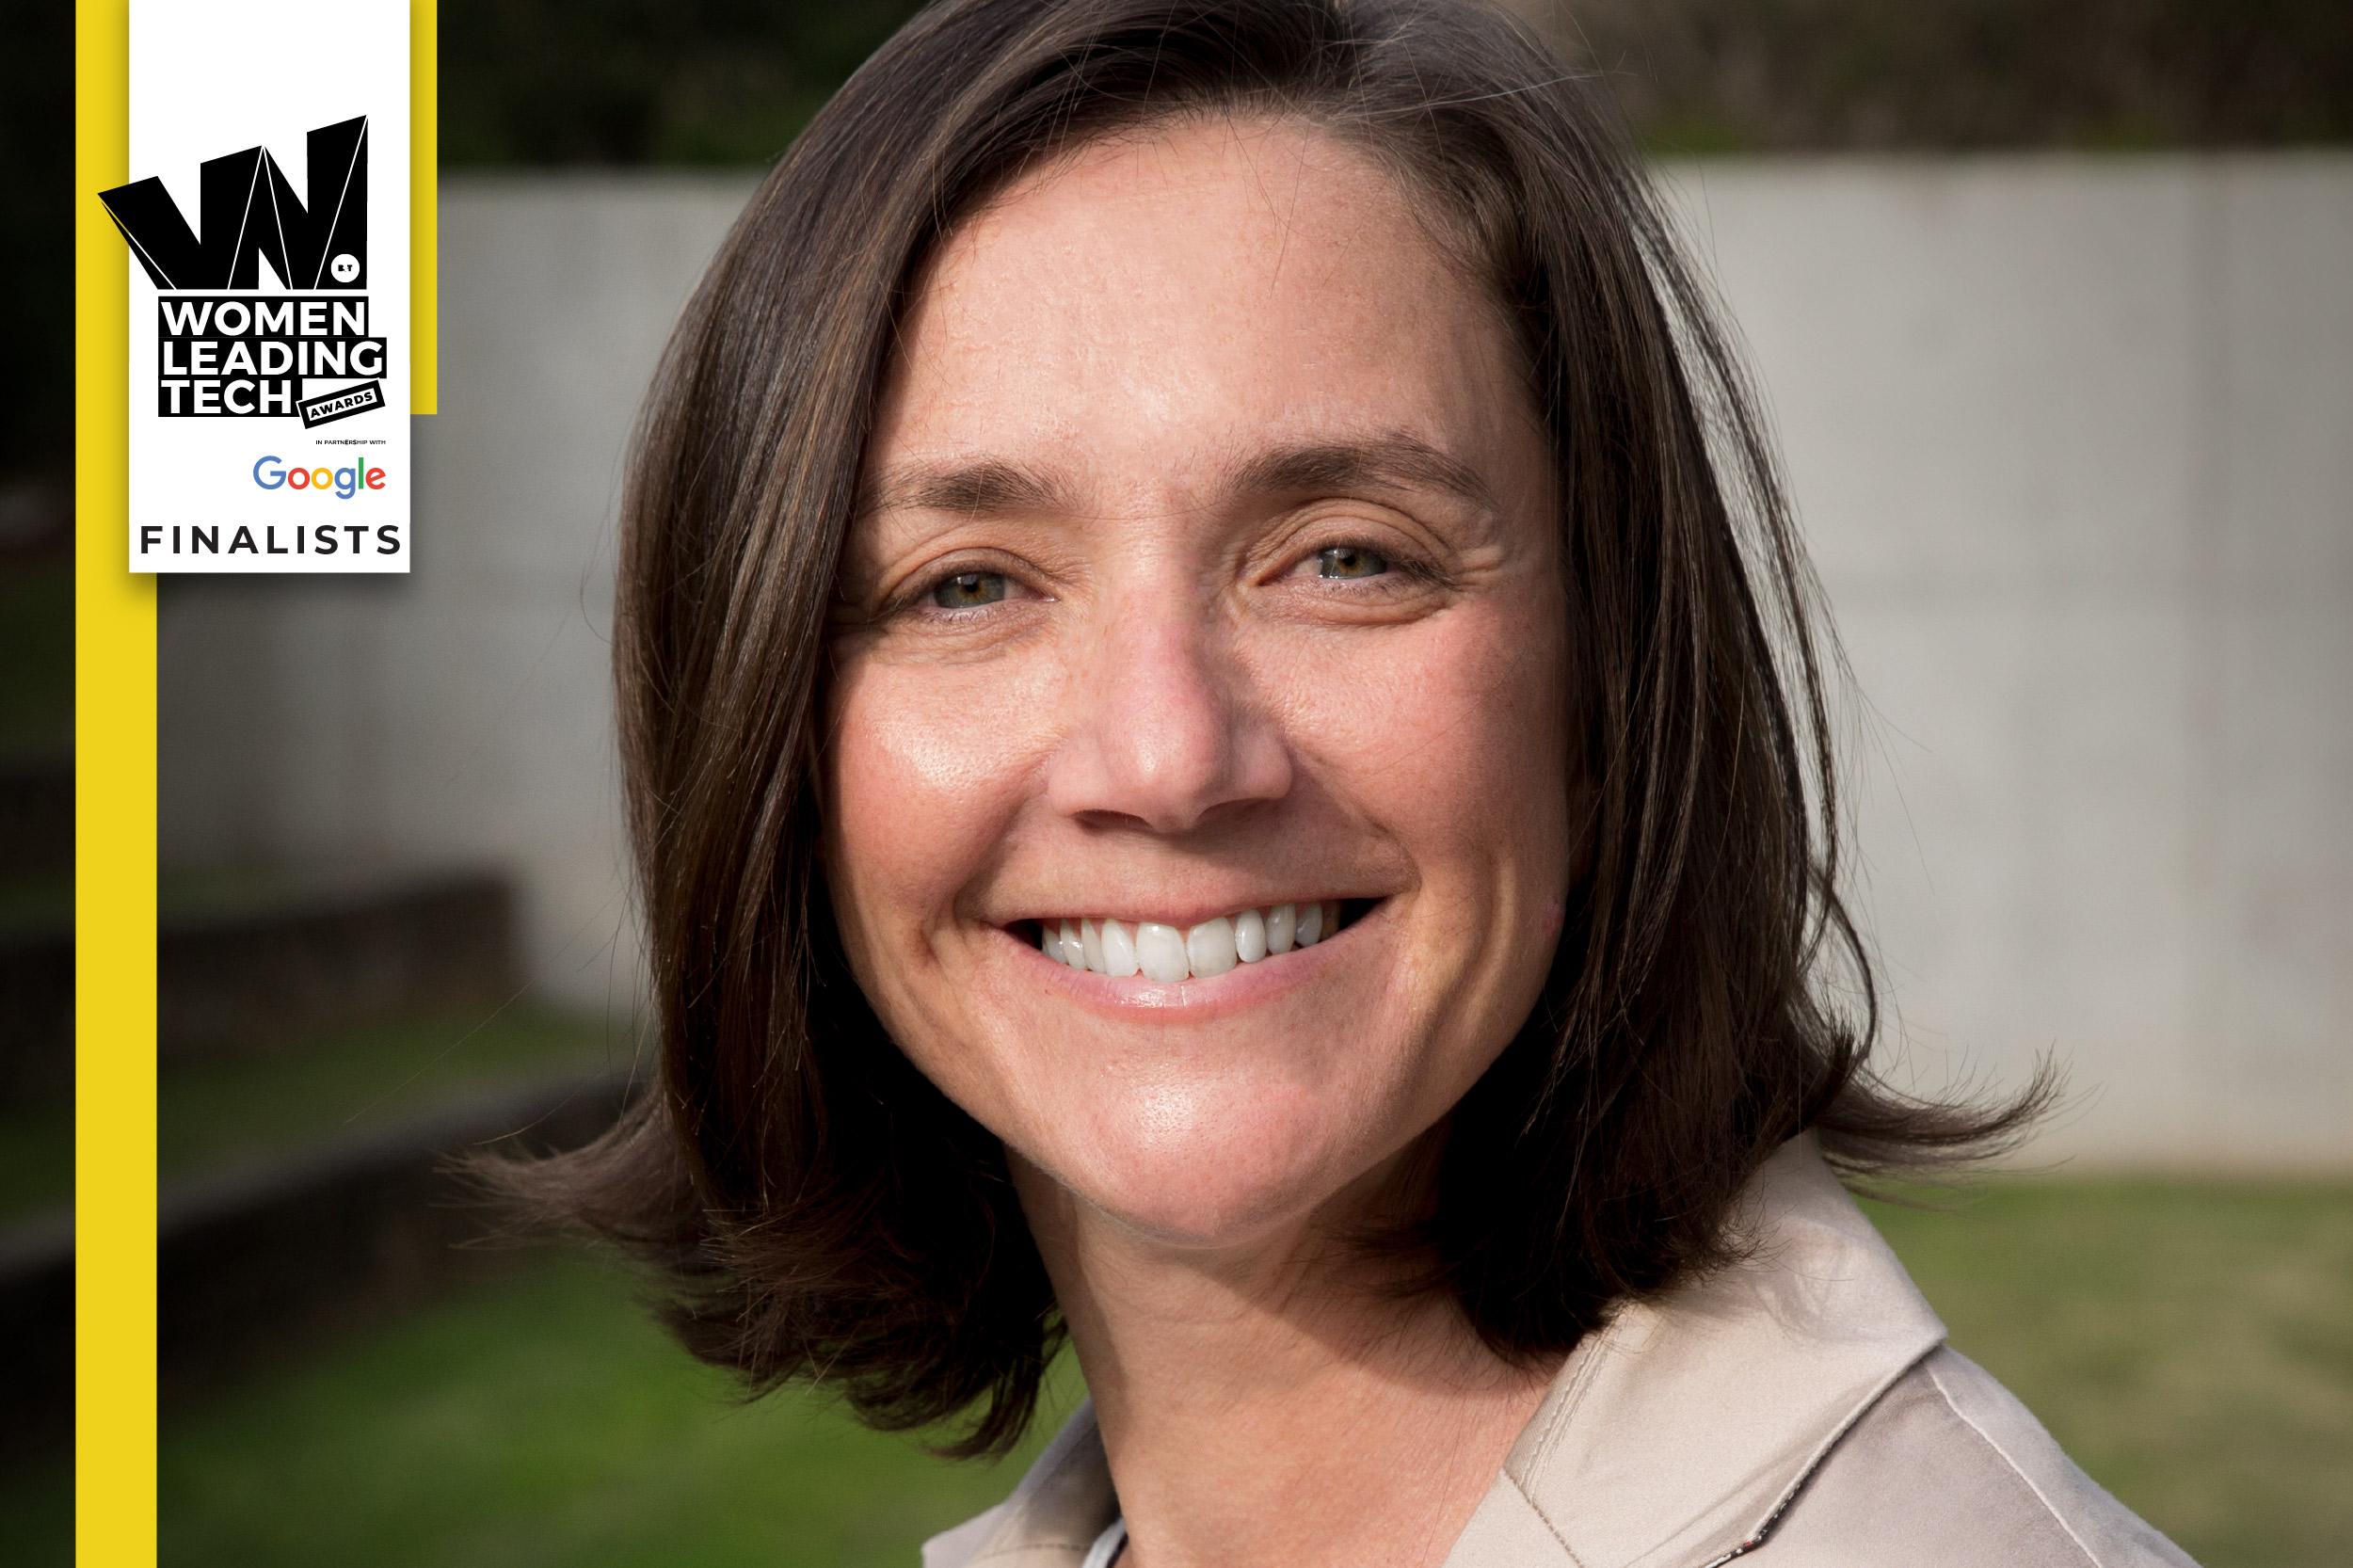 Meet The Women Leading Tech: Blackmores Marketing Manager Integrated Communications Rachelle McDermott